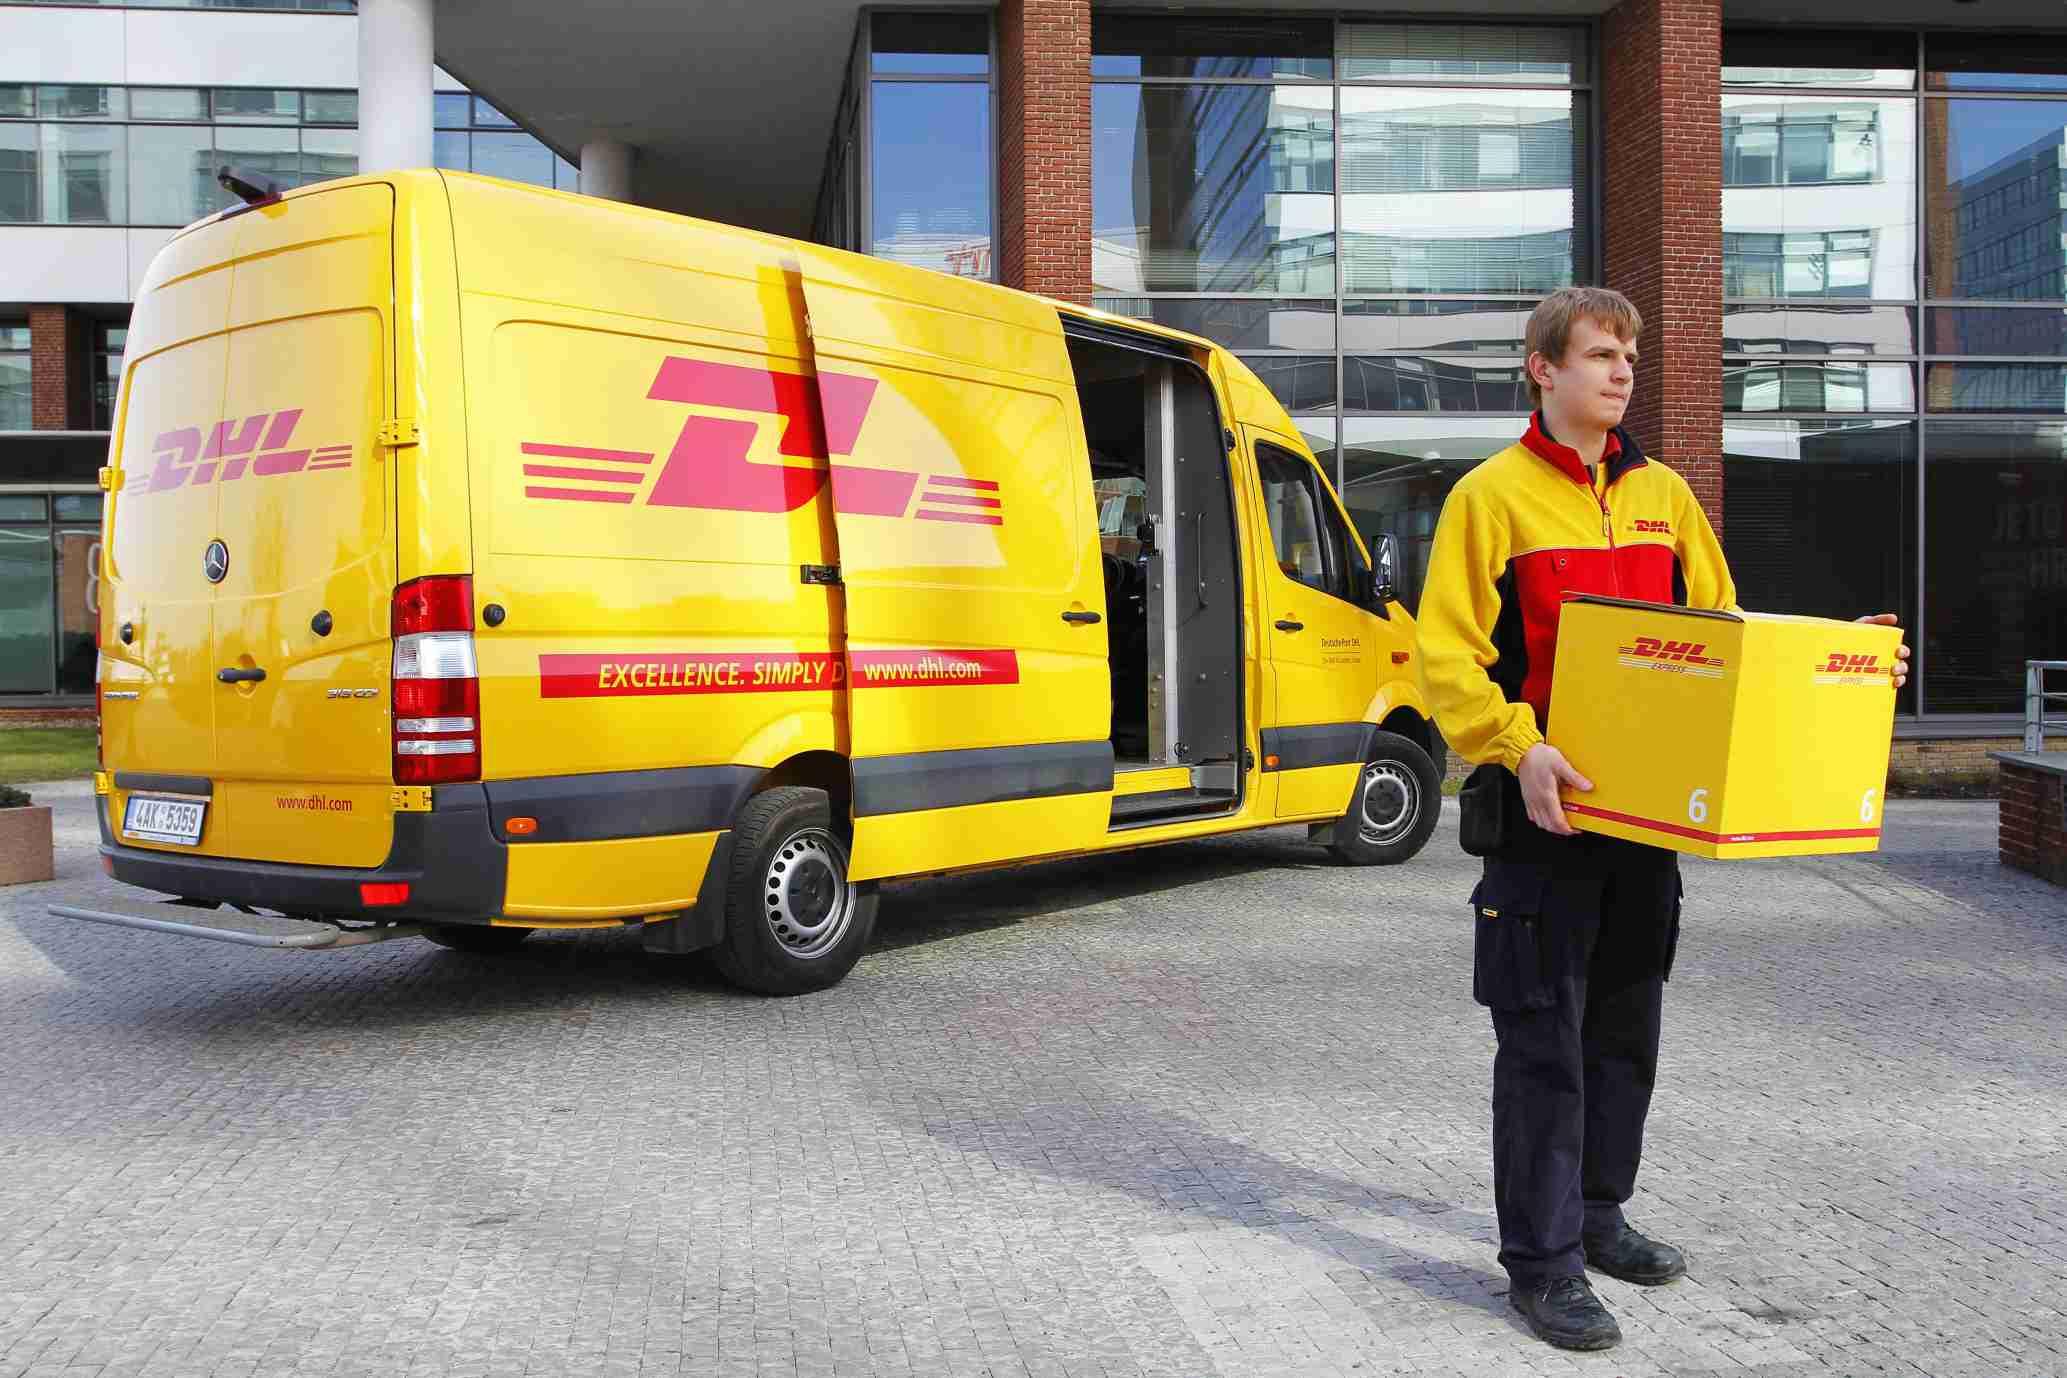 DHL_servicepoint | PROXIMA spol.s r.o.